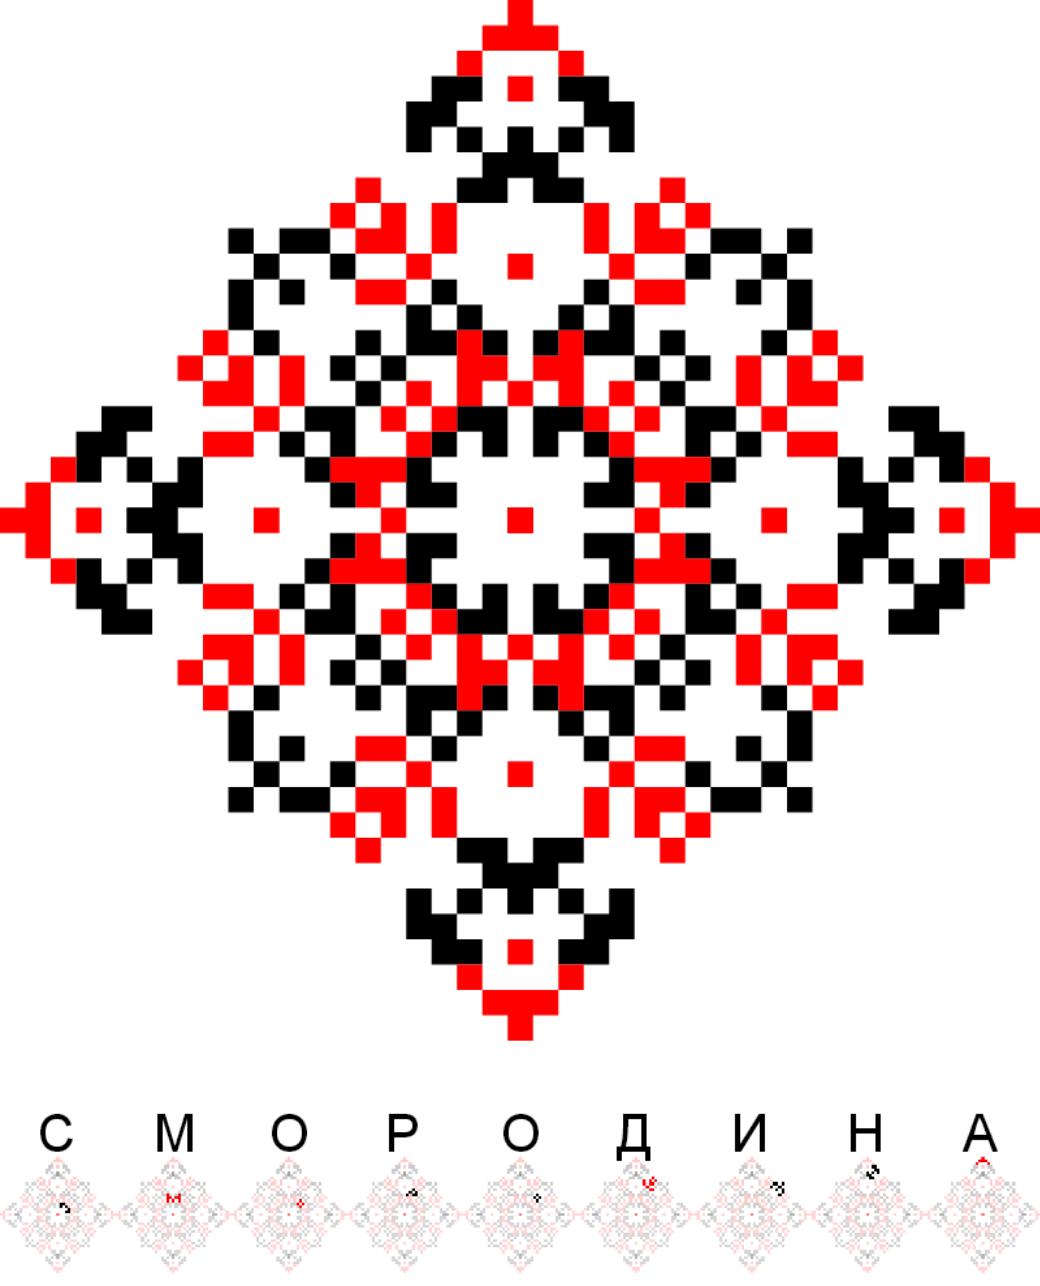 Текстовий слов'янський орнамент: Смородина